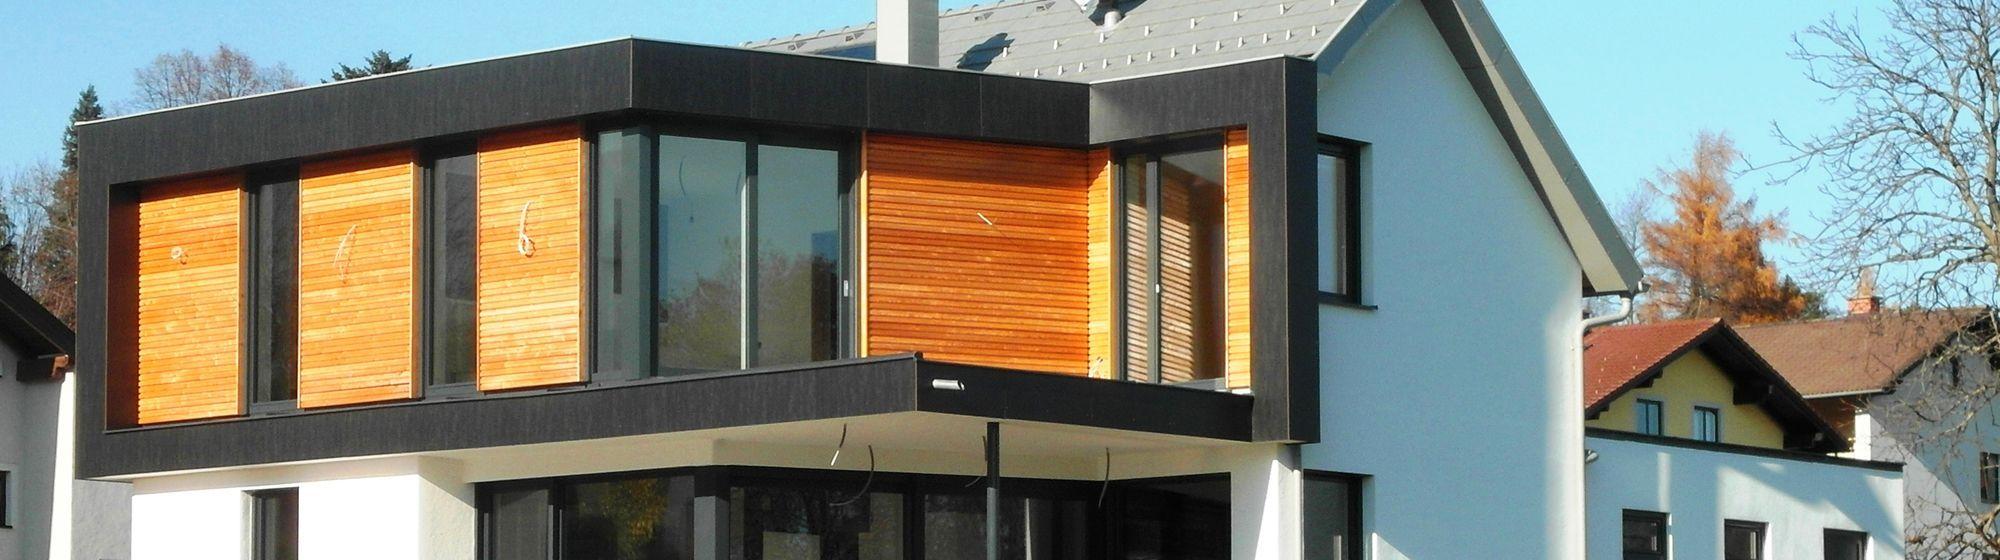 Haidbauer Holzbau - Anbau